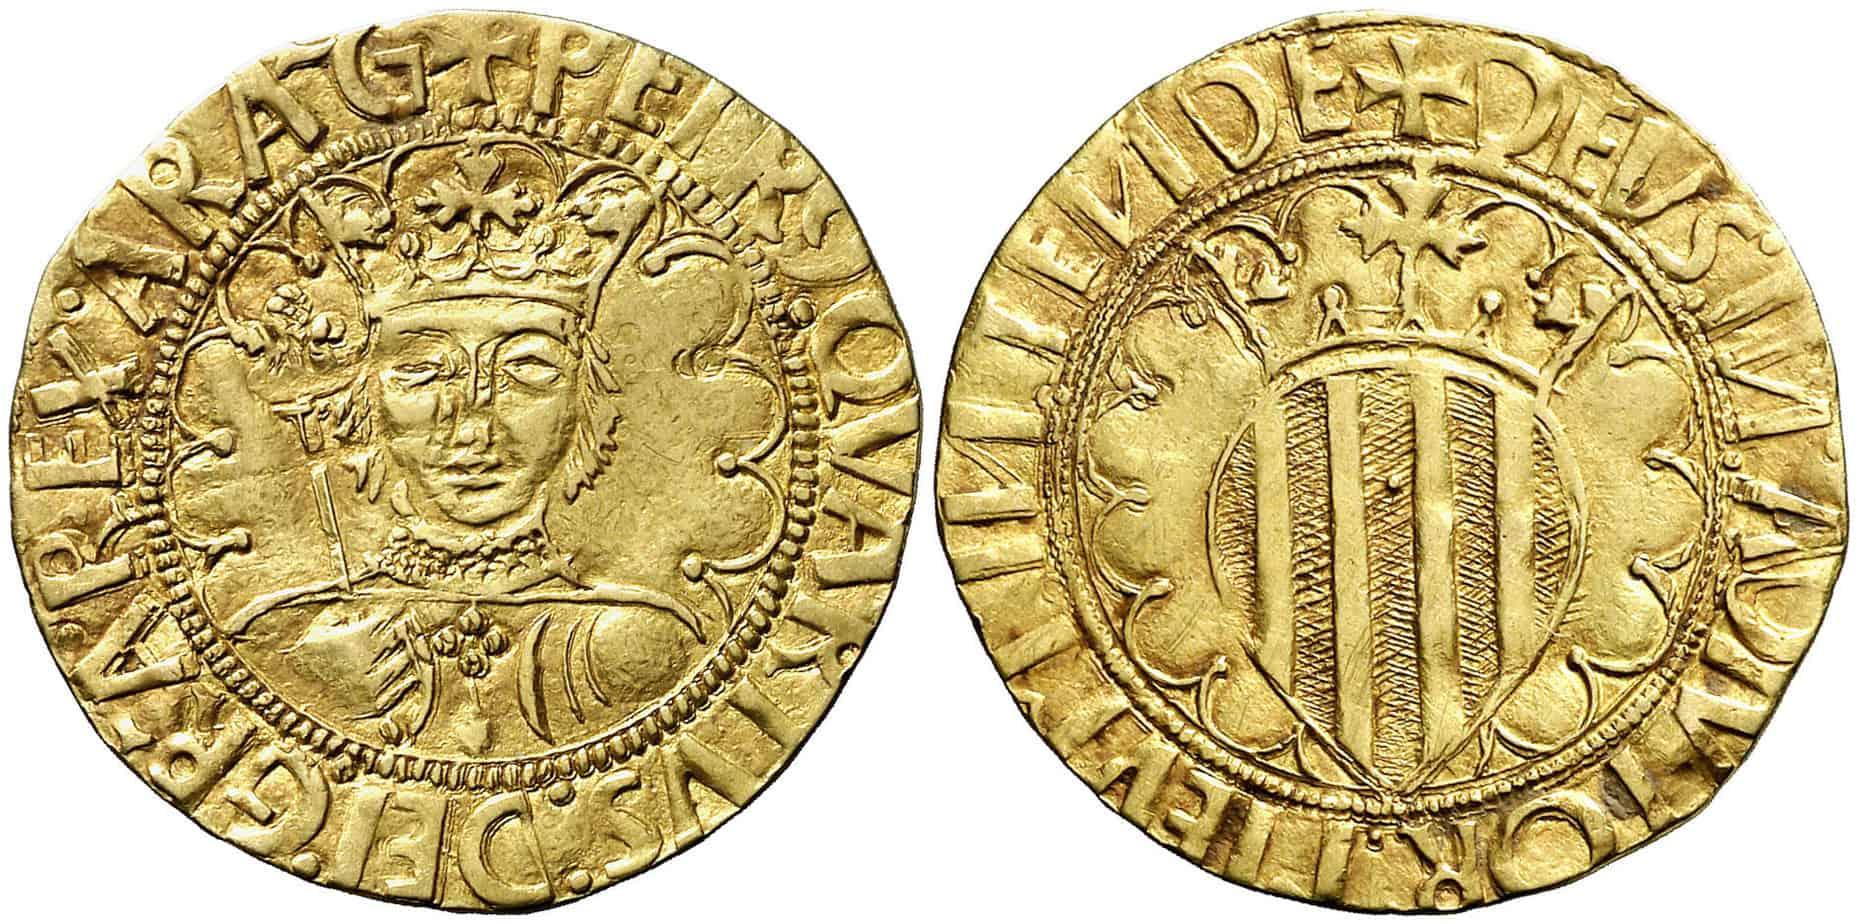 Las monedas de la Guerra Civil Catalana (1462-1472)